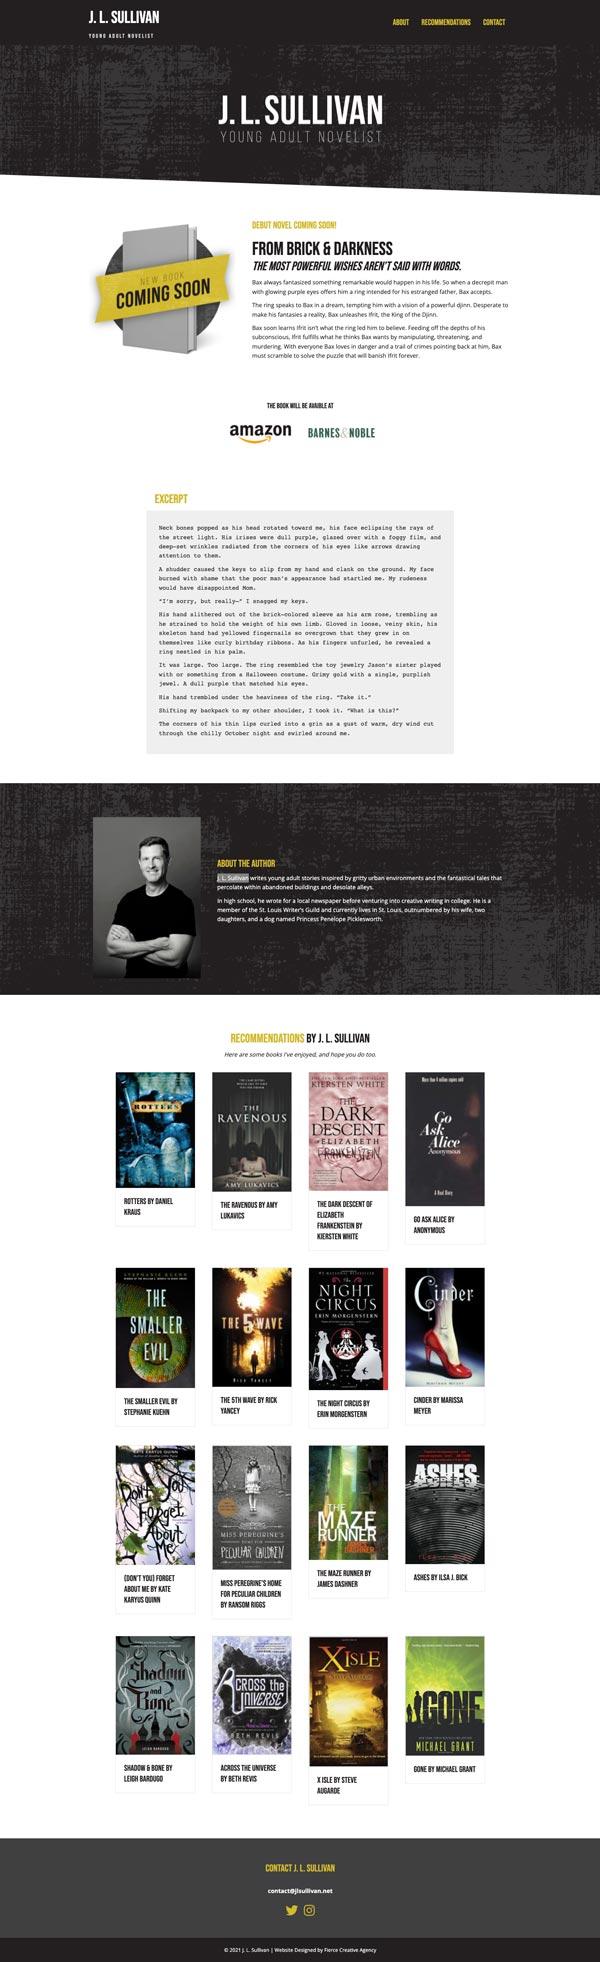 J L Sullivan website